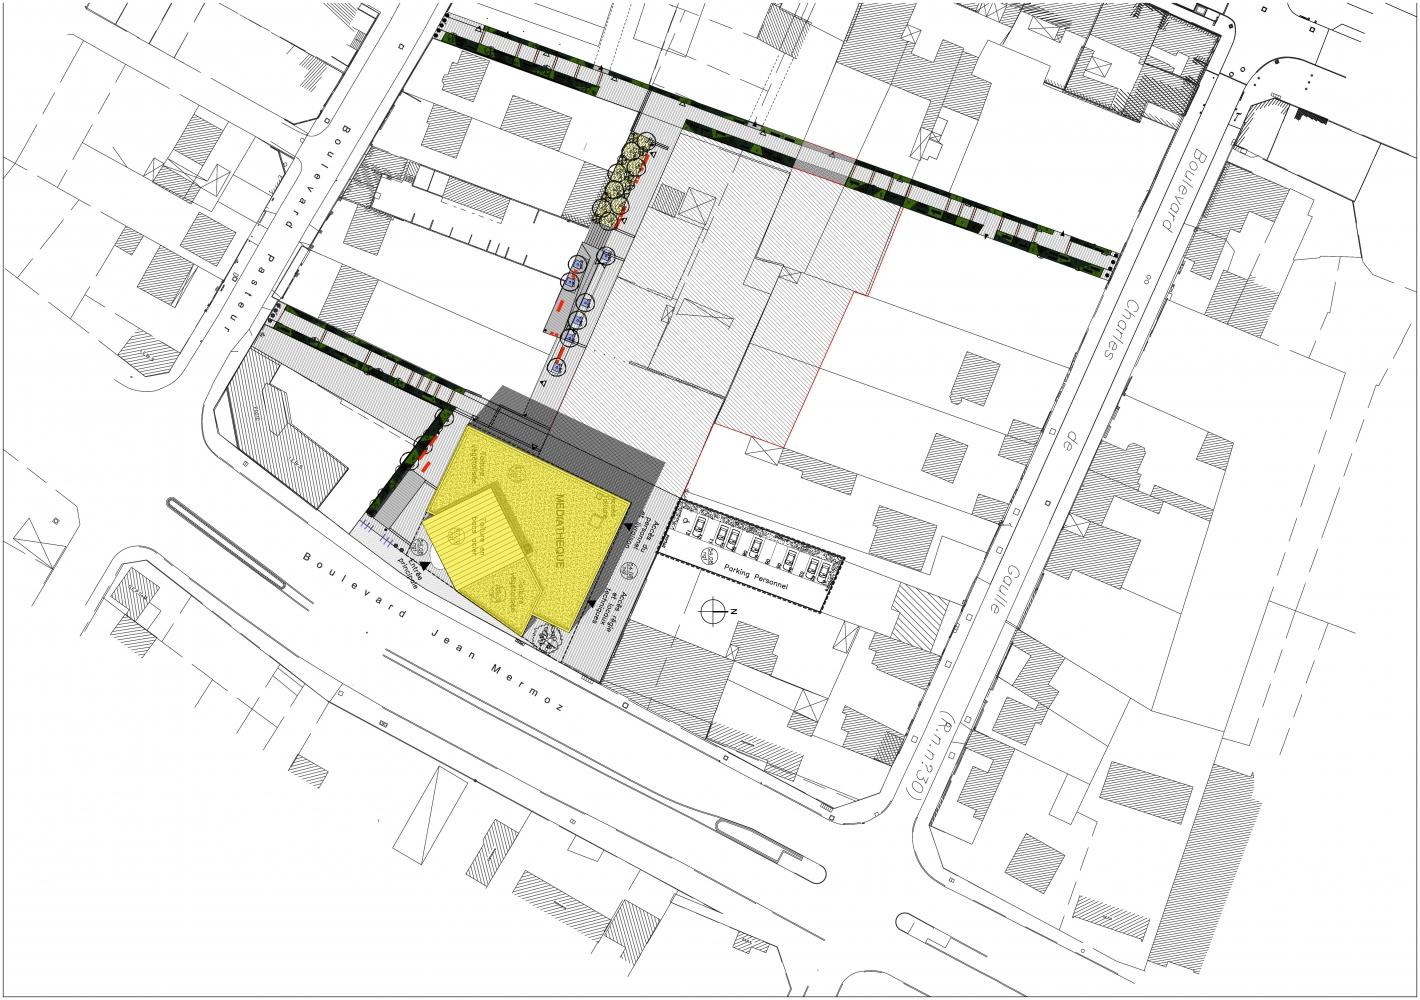 07-pierrefitte-img-002 Pascale SEURIN Architecte - Pascale SEURIN Architecte